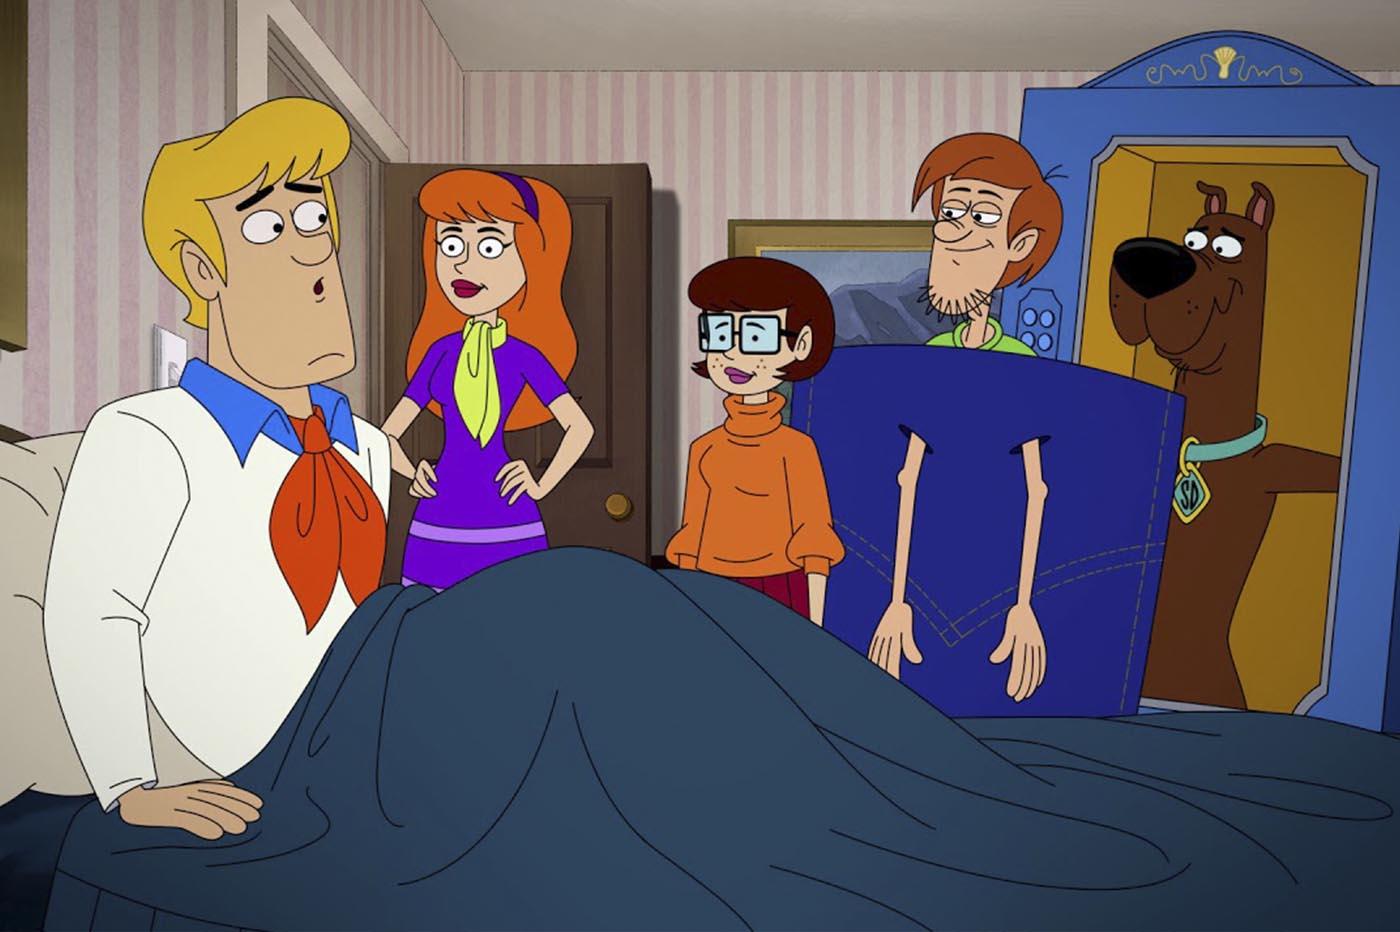 ¡Enróllate Scooby-Doo!